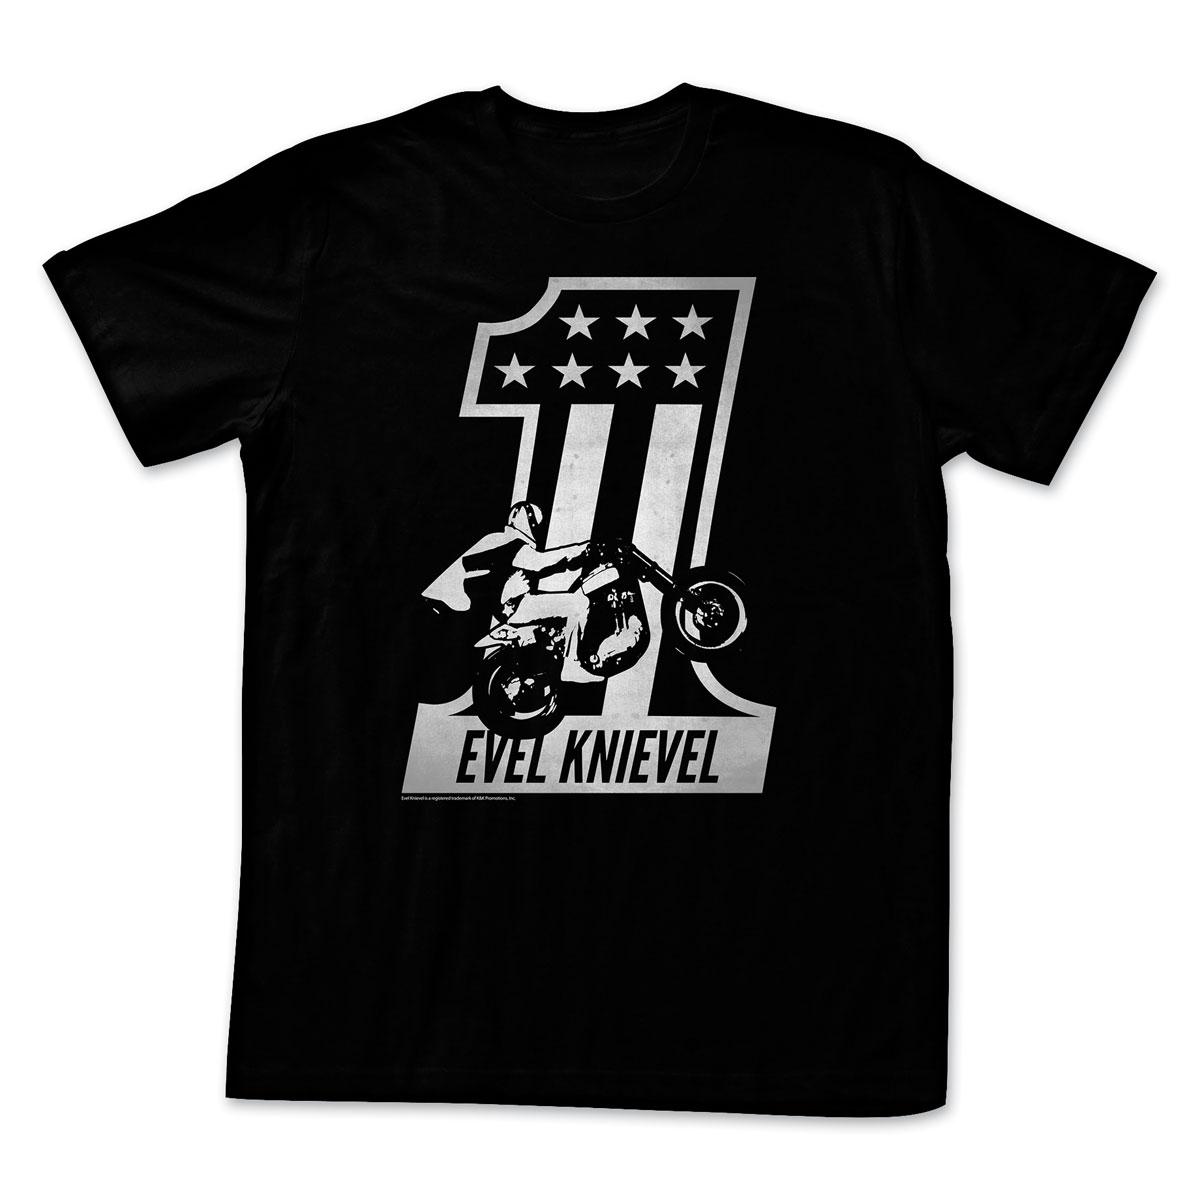 Evil Knievel Black One Men's Black Short Sleeve T-Shirt